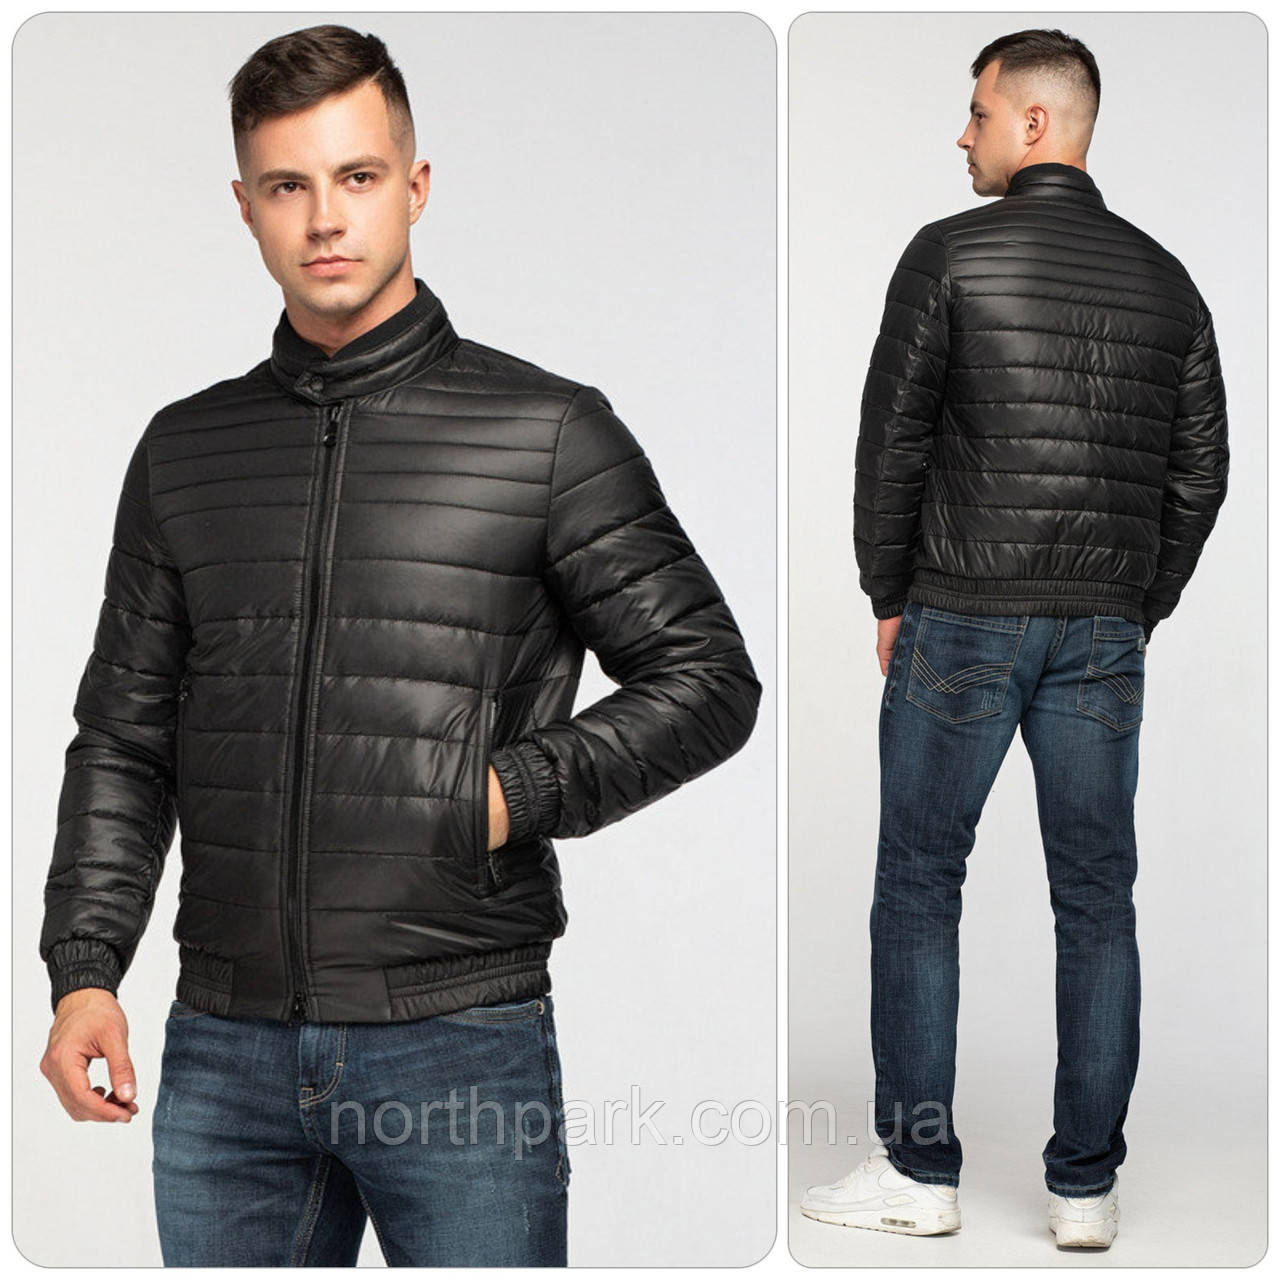 Мужская осенняя куртка - бомбер в спортивном стиле